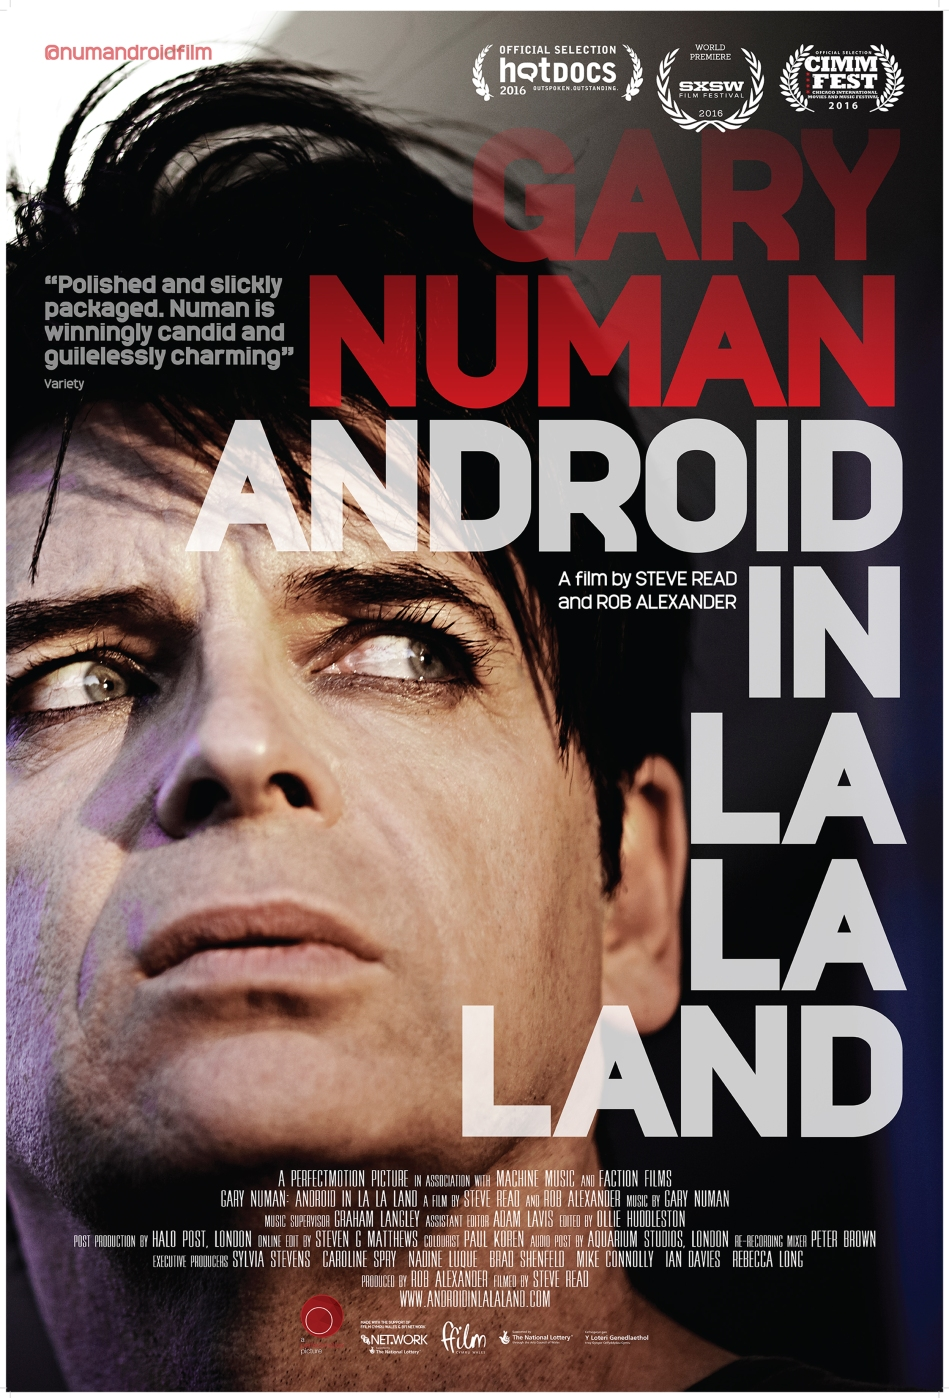 gary-numan-android-in-la-la-land-cannes-poster-27x40